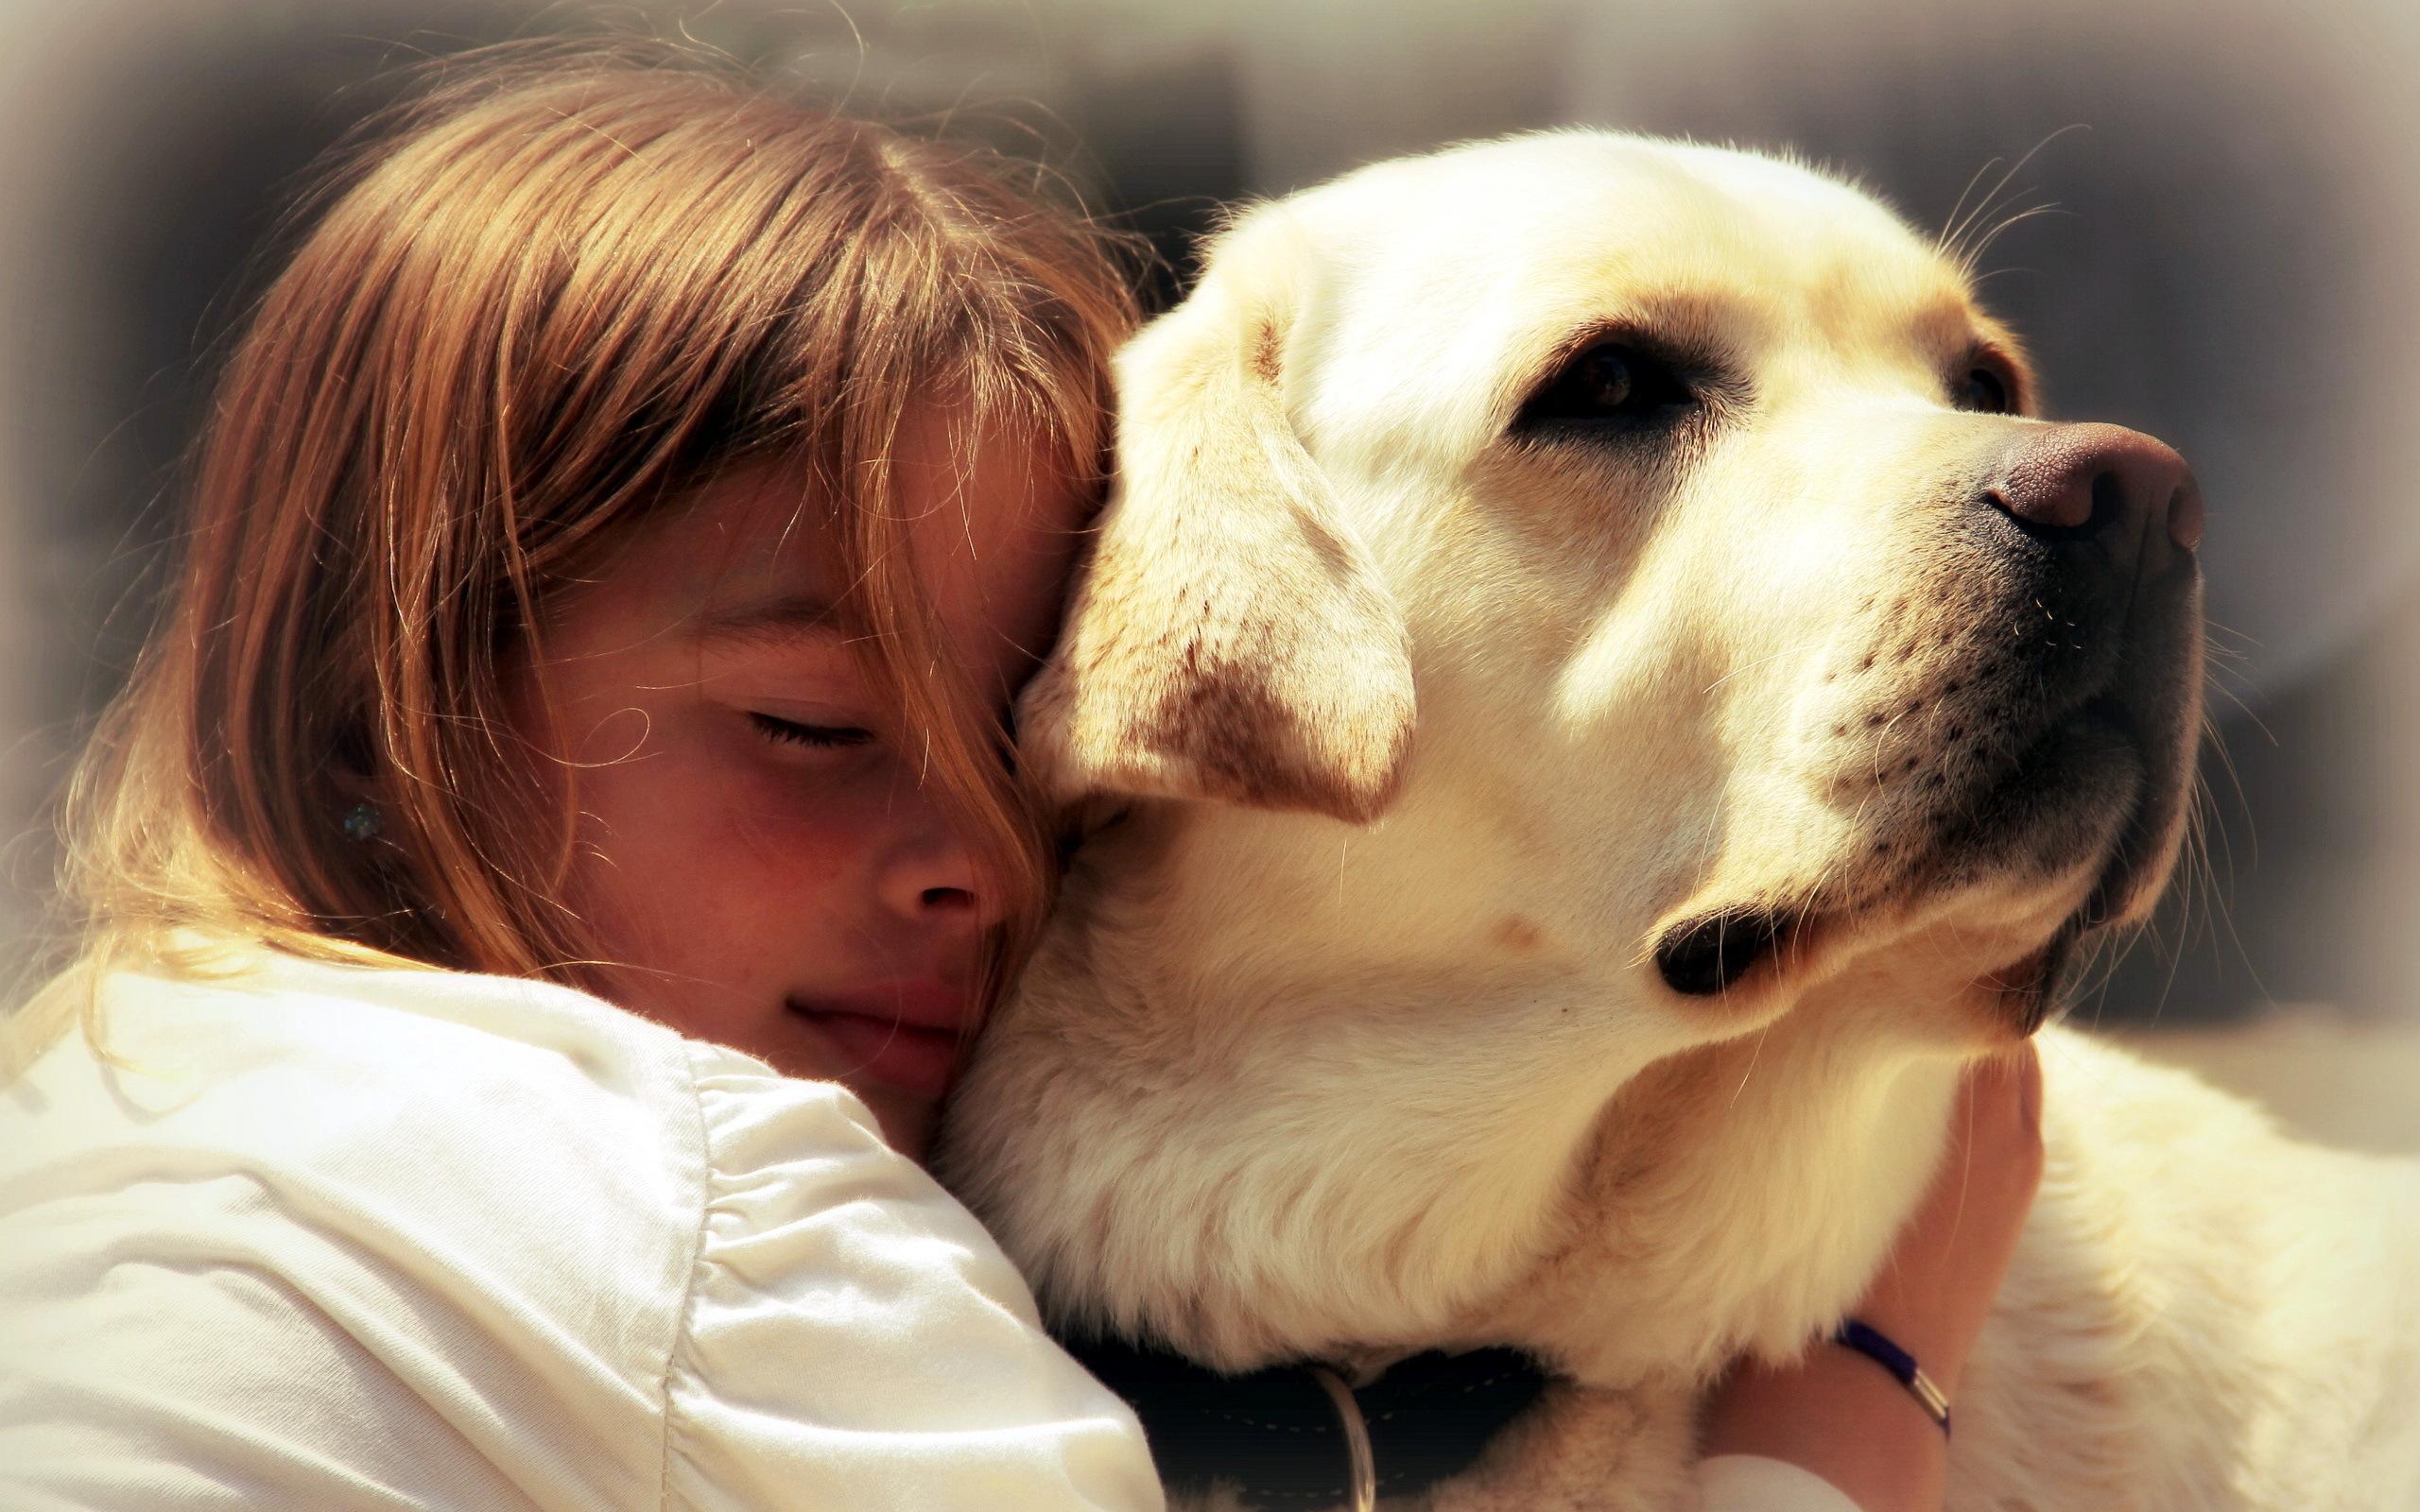 человек и собака фото картинки к-поп